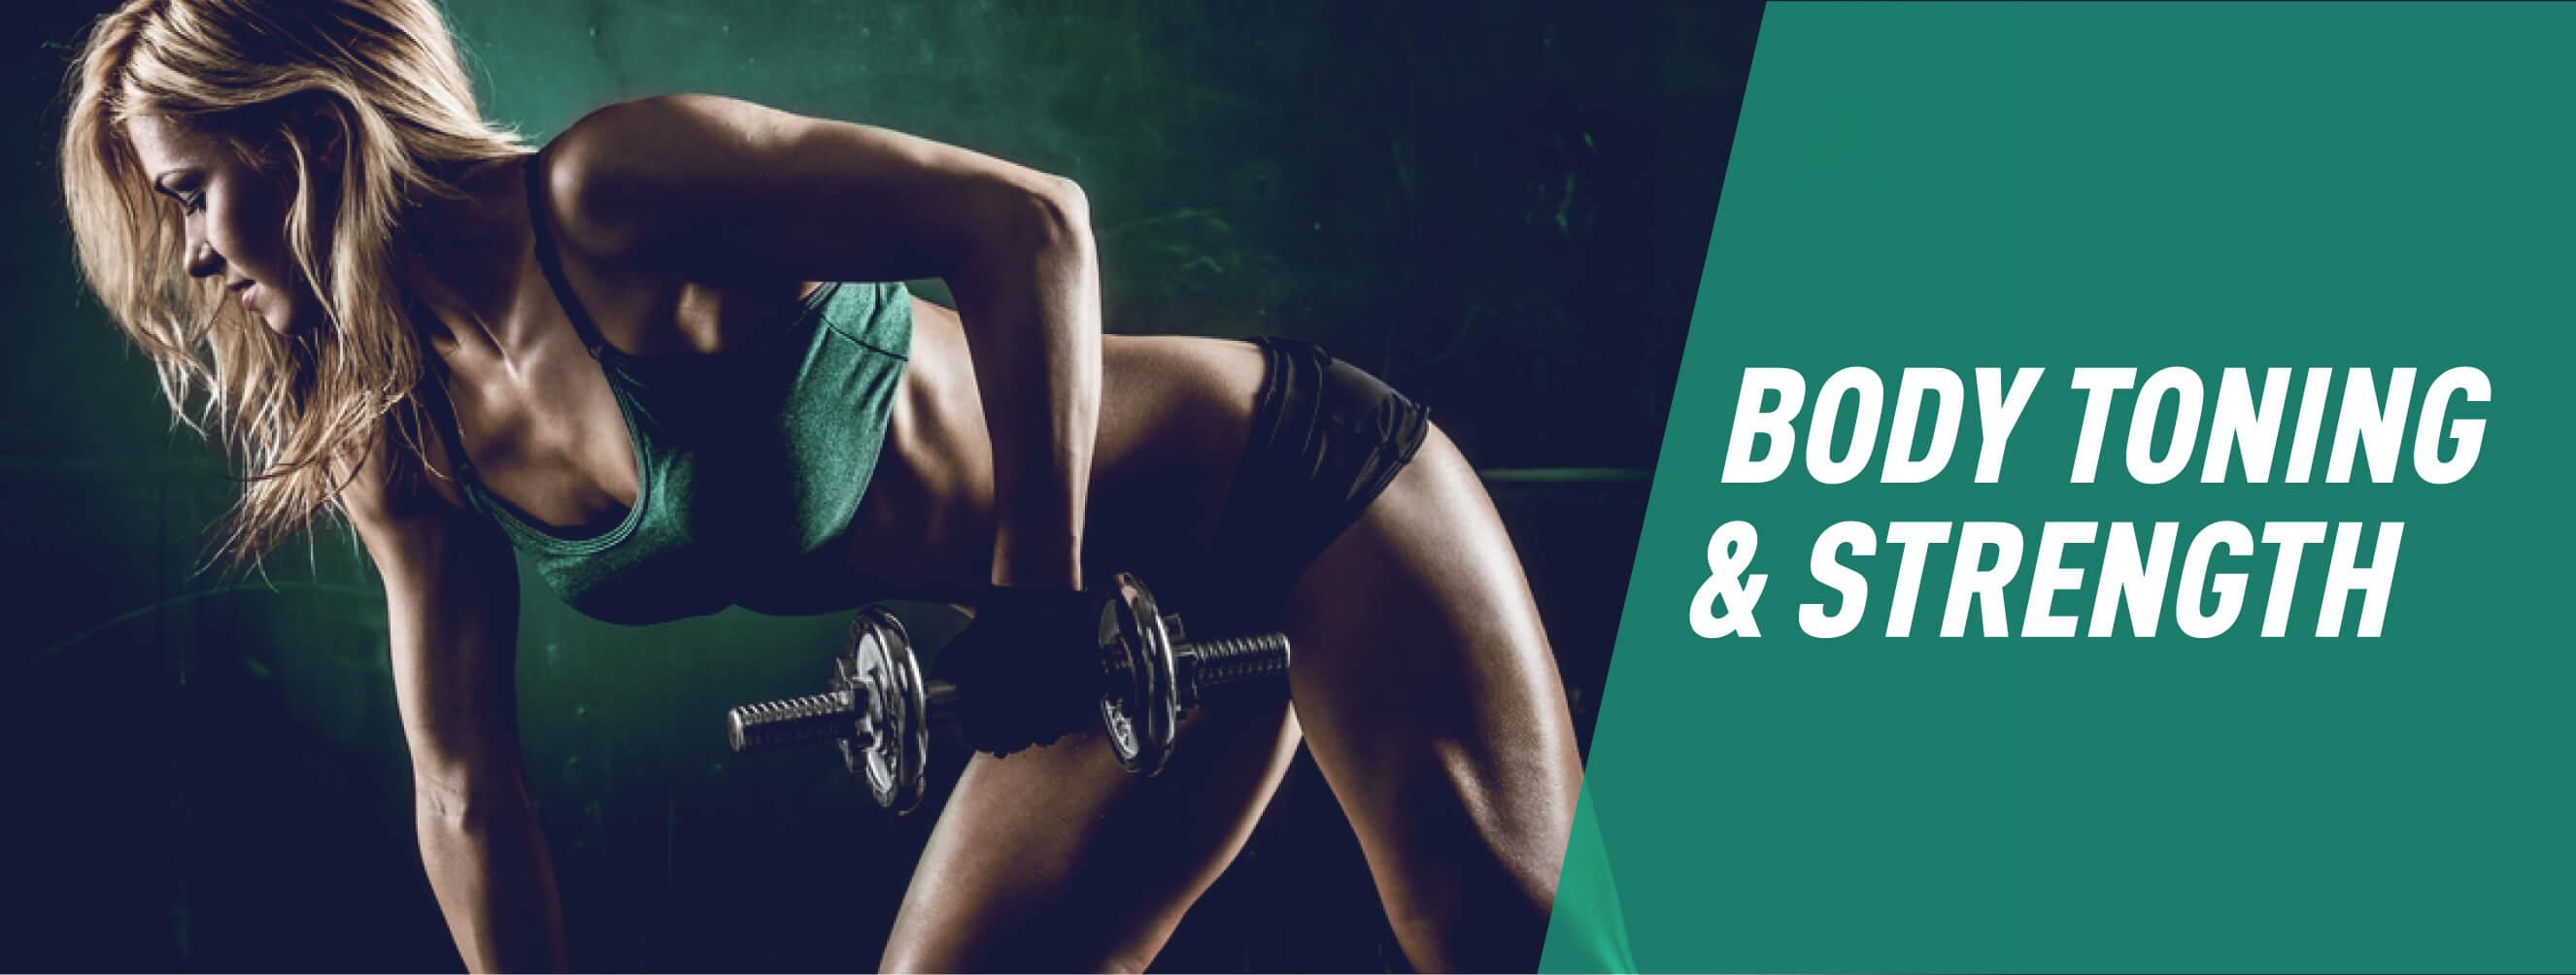 Body Toning & Strength - Online Programme